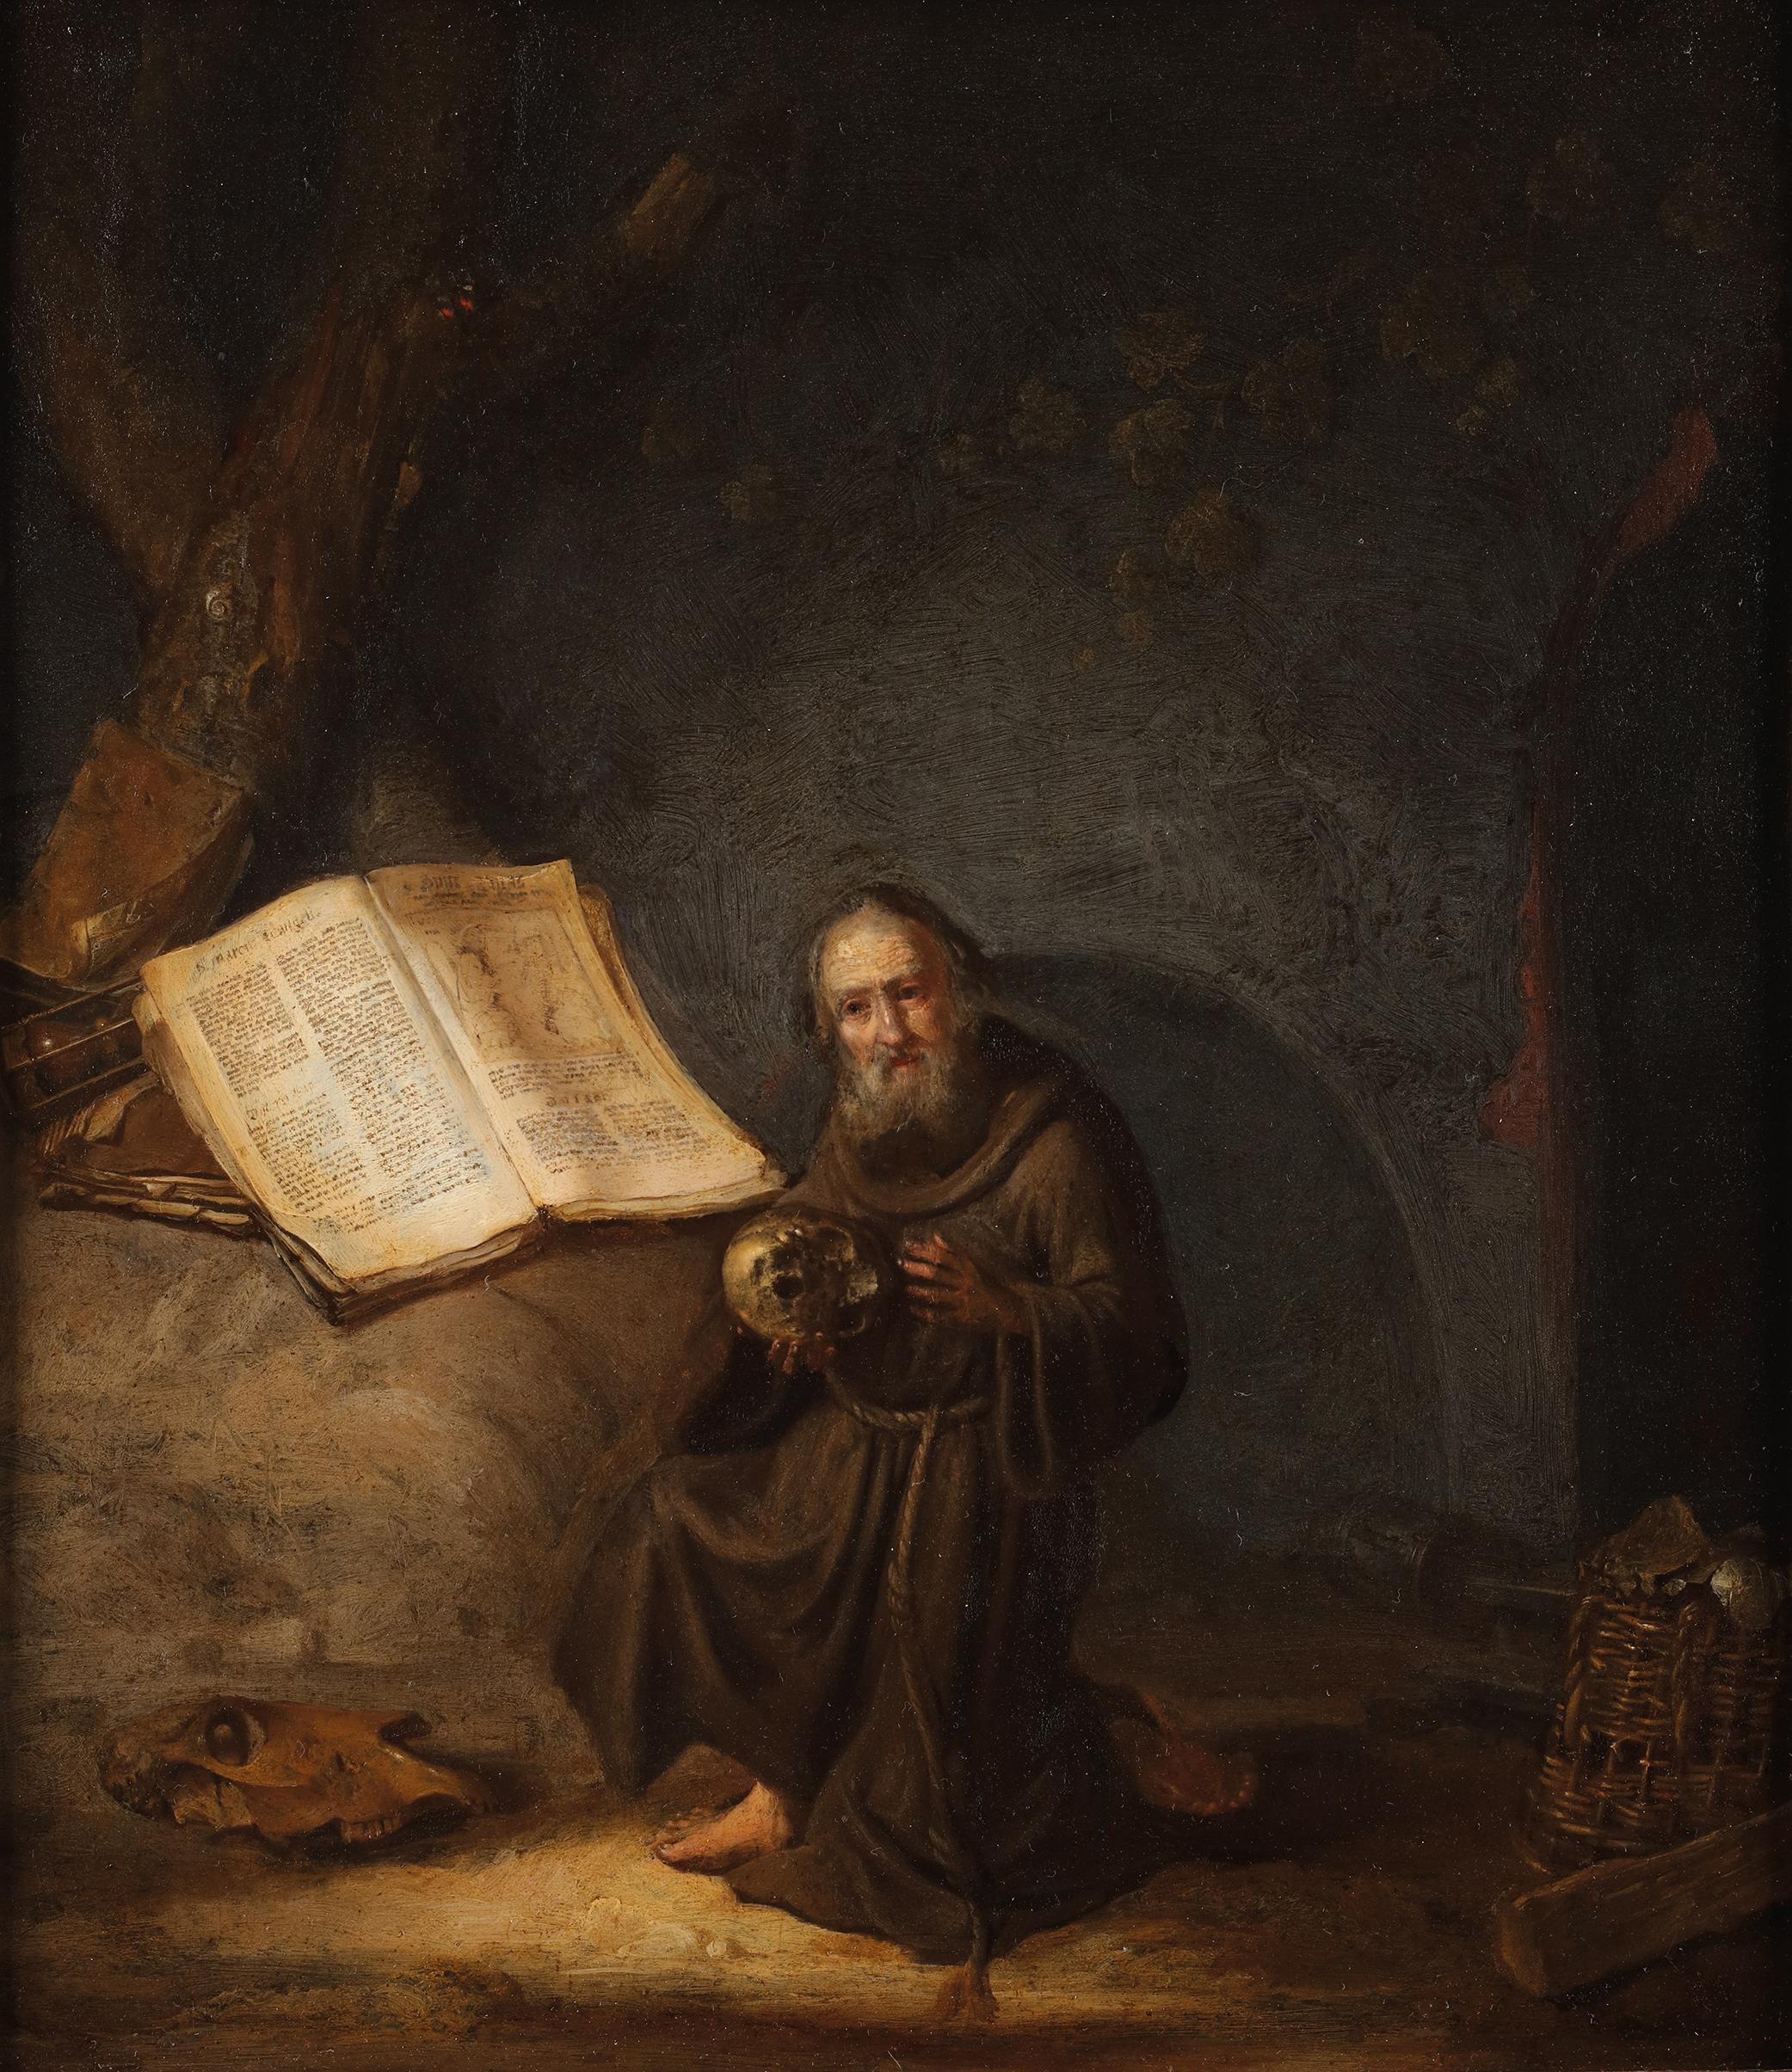 A hermit reading the Marcus gospel